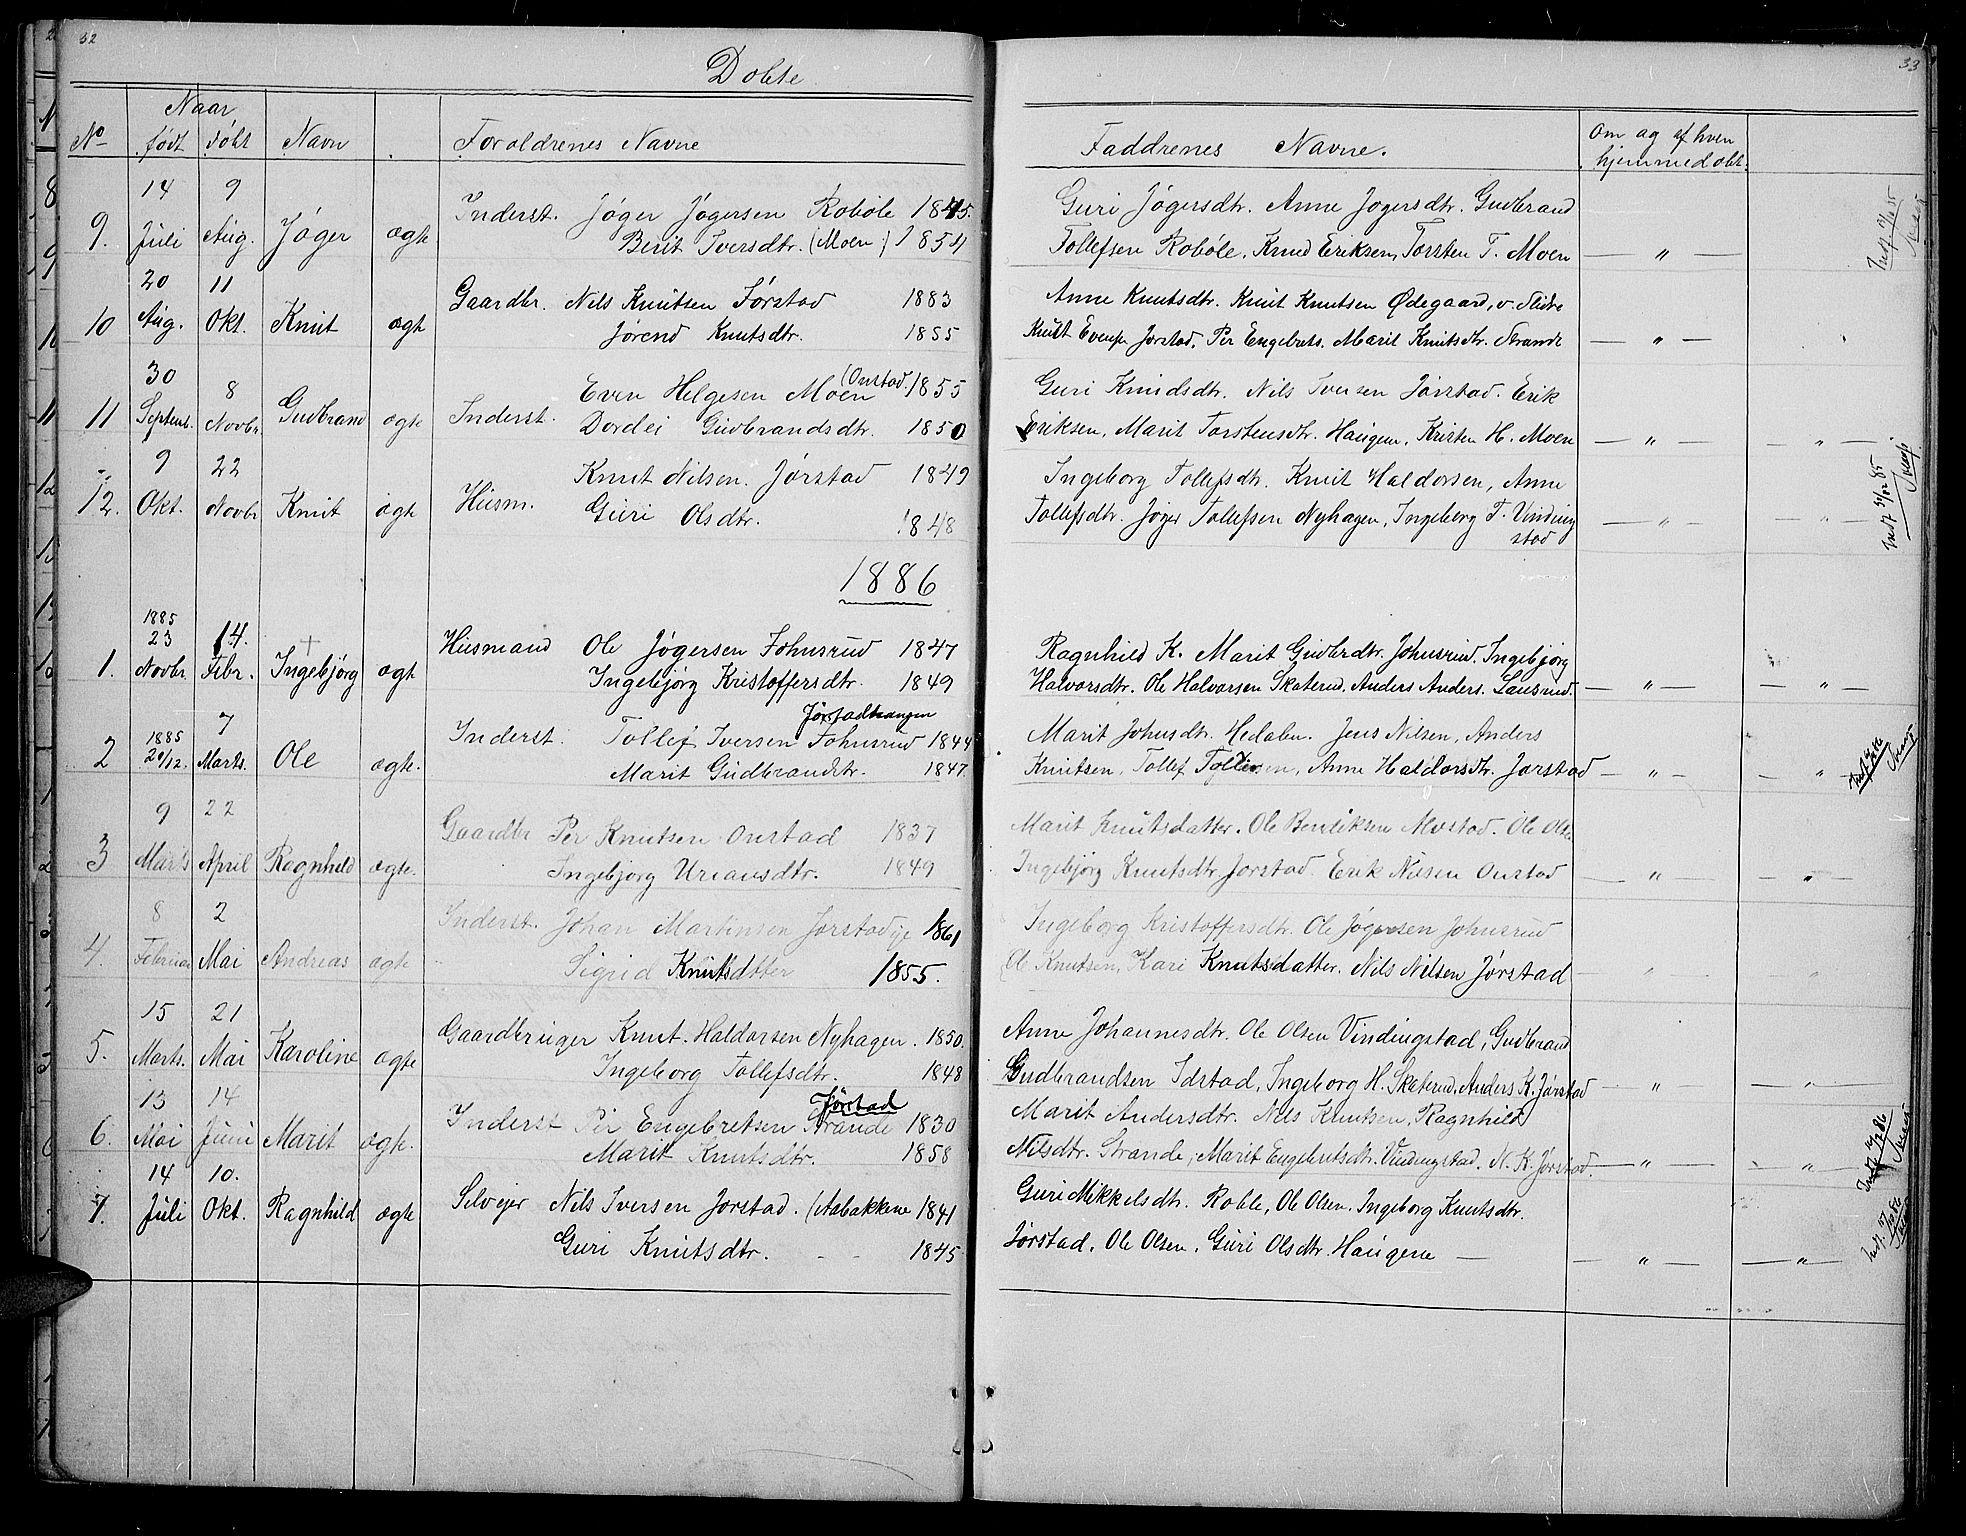 SAH, Øystre Slidre prestekontor, Klokkerbok nr. 2, 1866-1886, s. 32-33